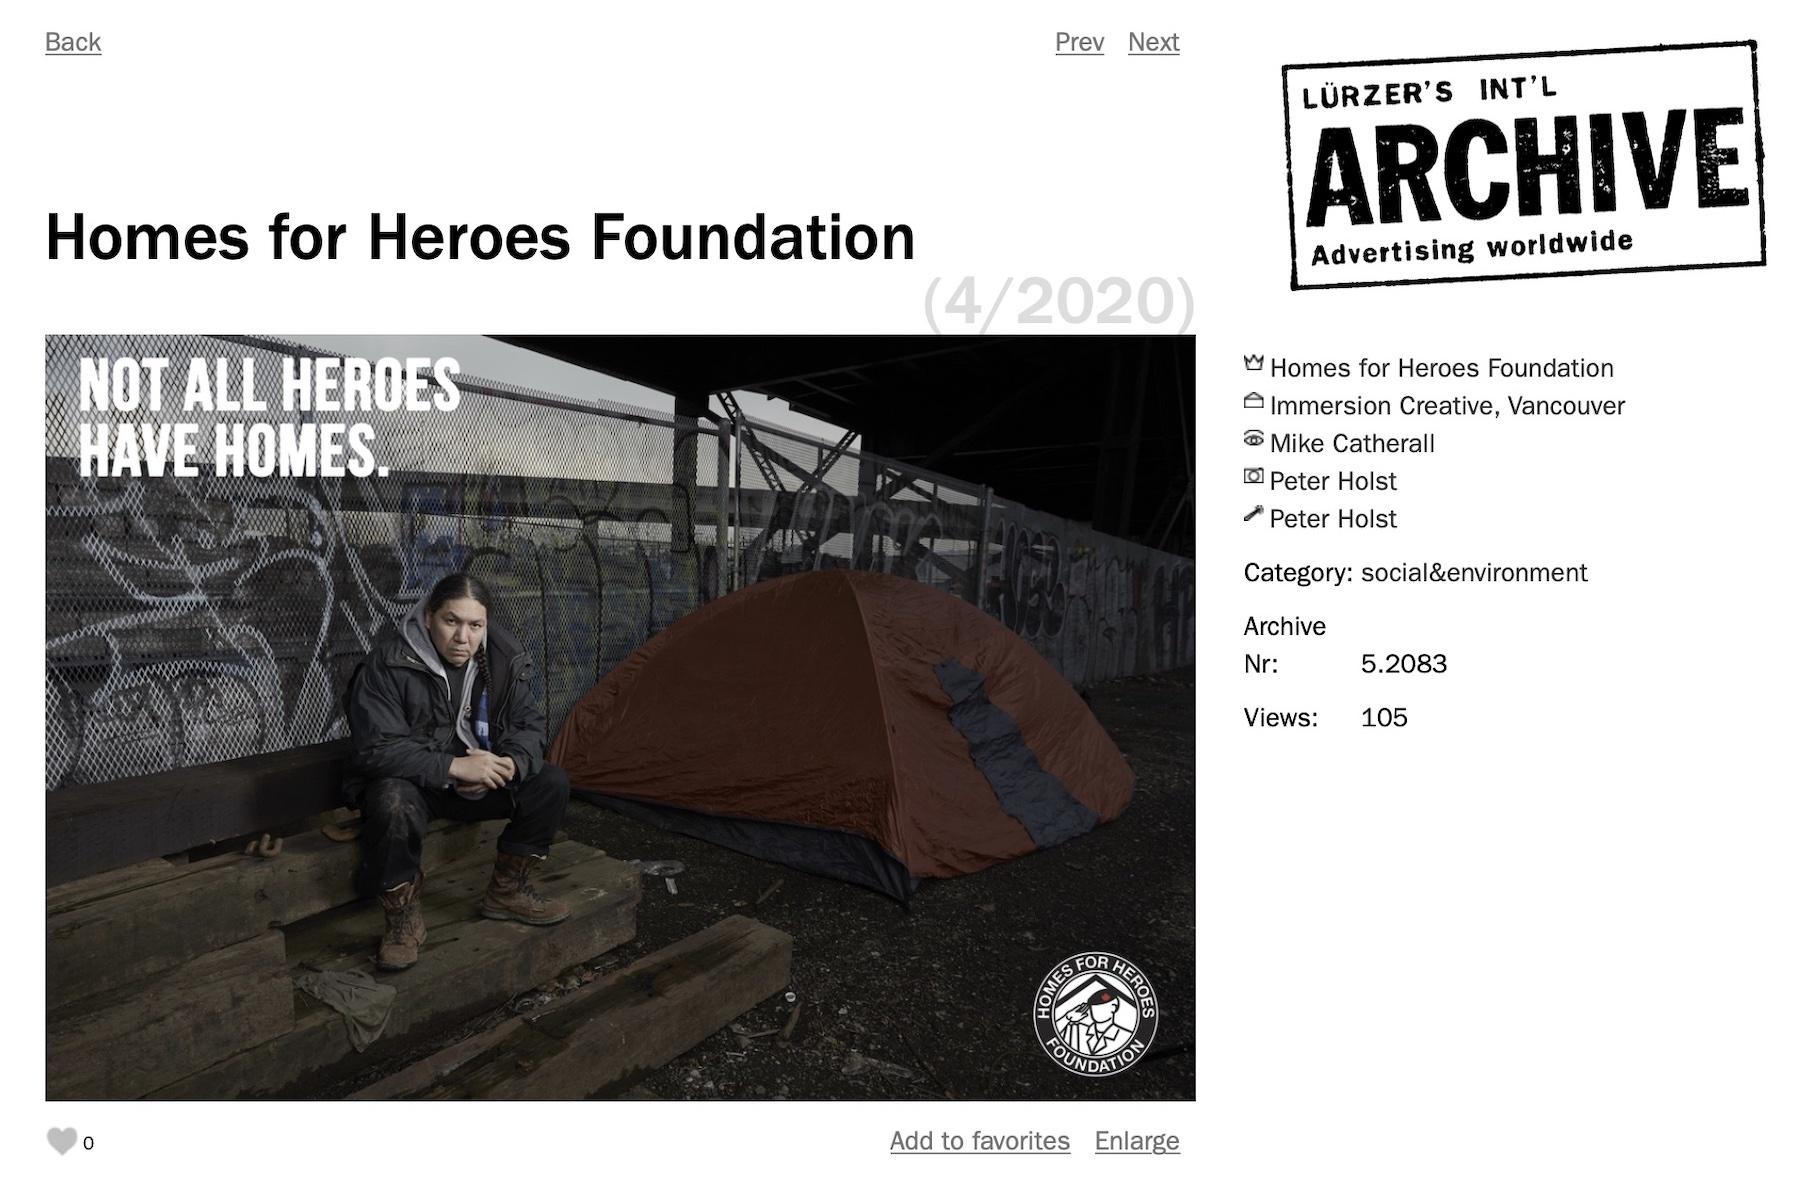 Lurzers Archive ads for homeless veterans